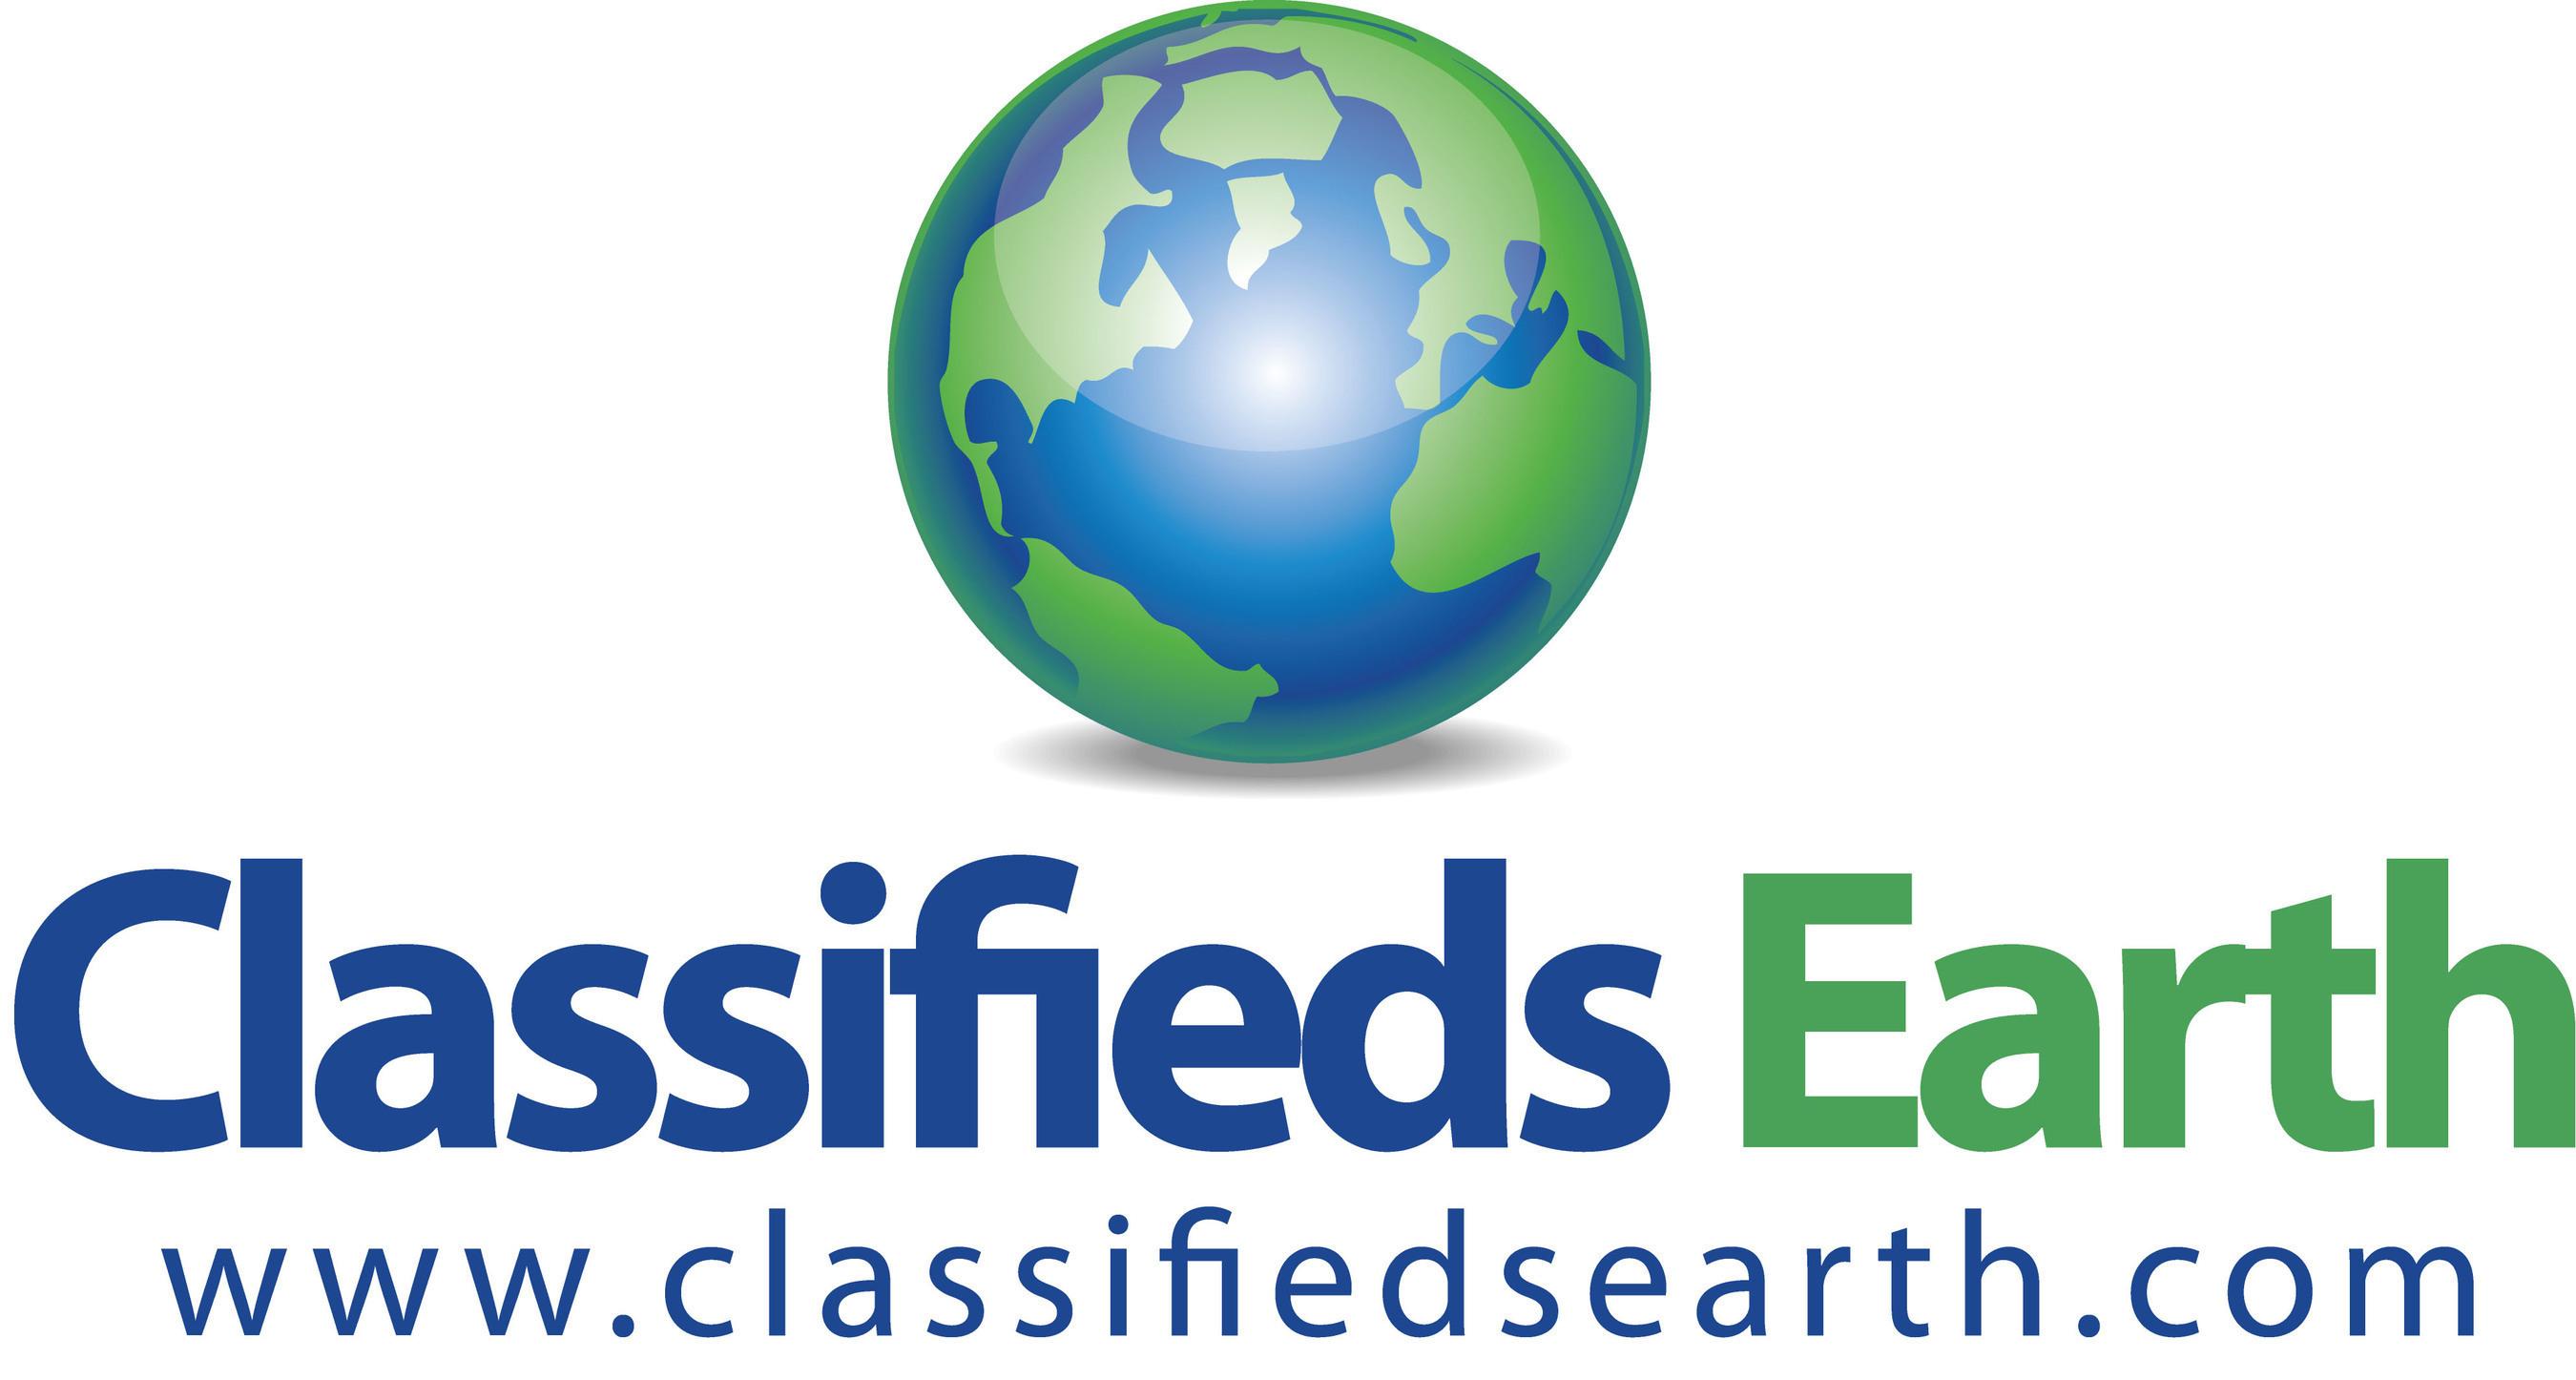 ClassifiedsEarth.com Logo (PRNewsFoto/ClassifiedsEarth.com)